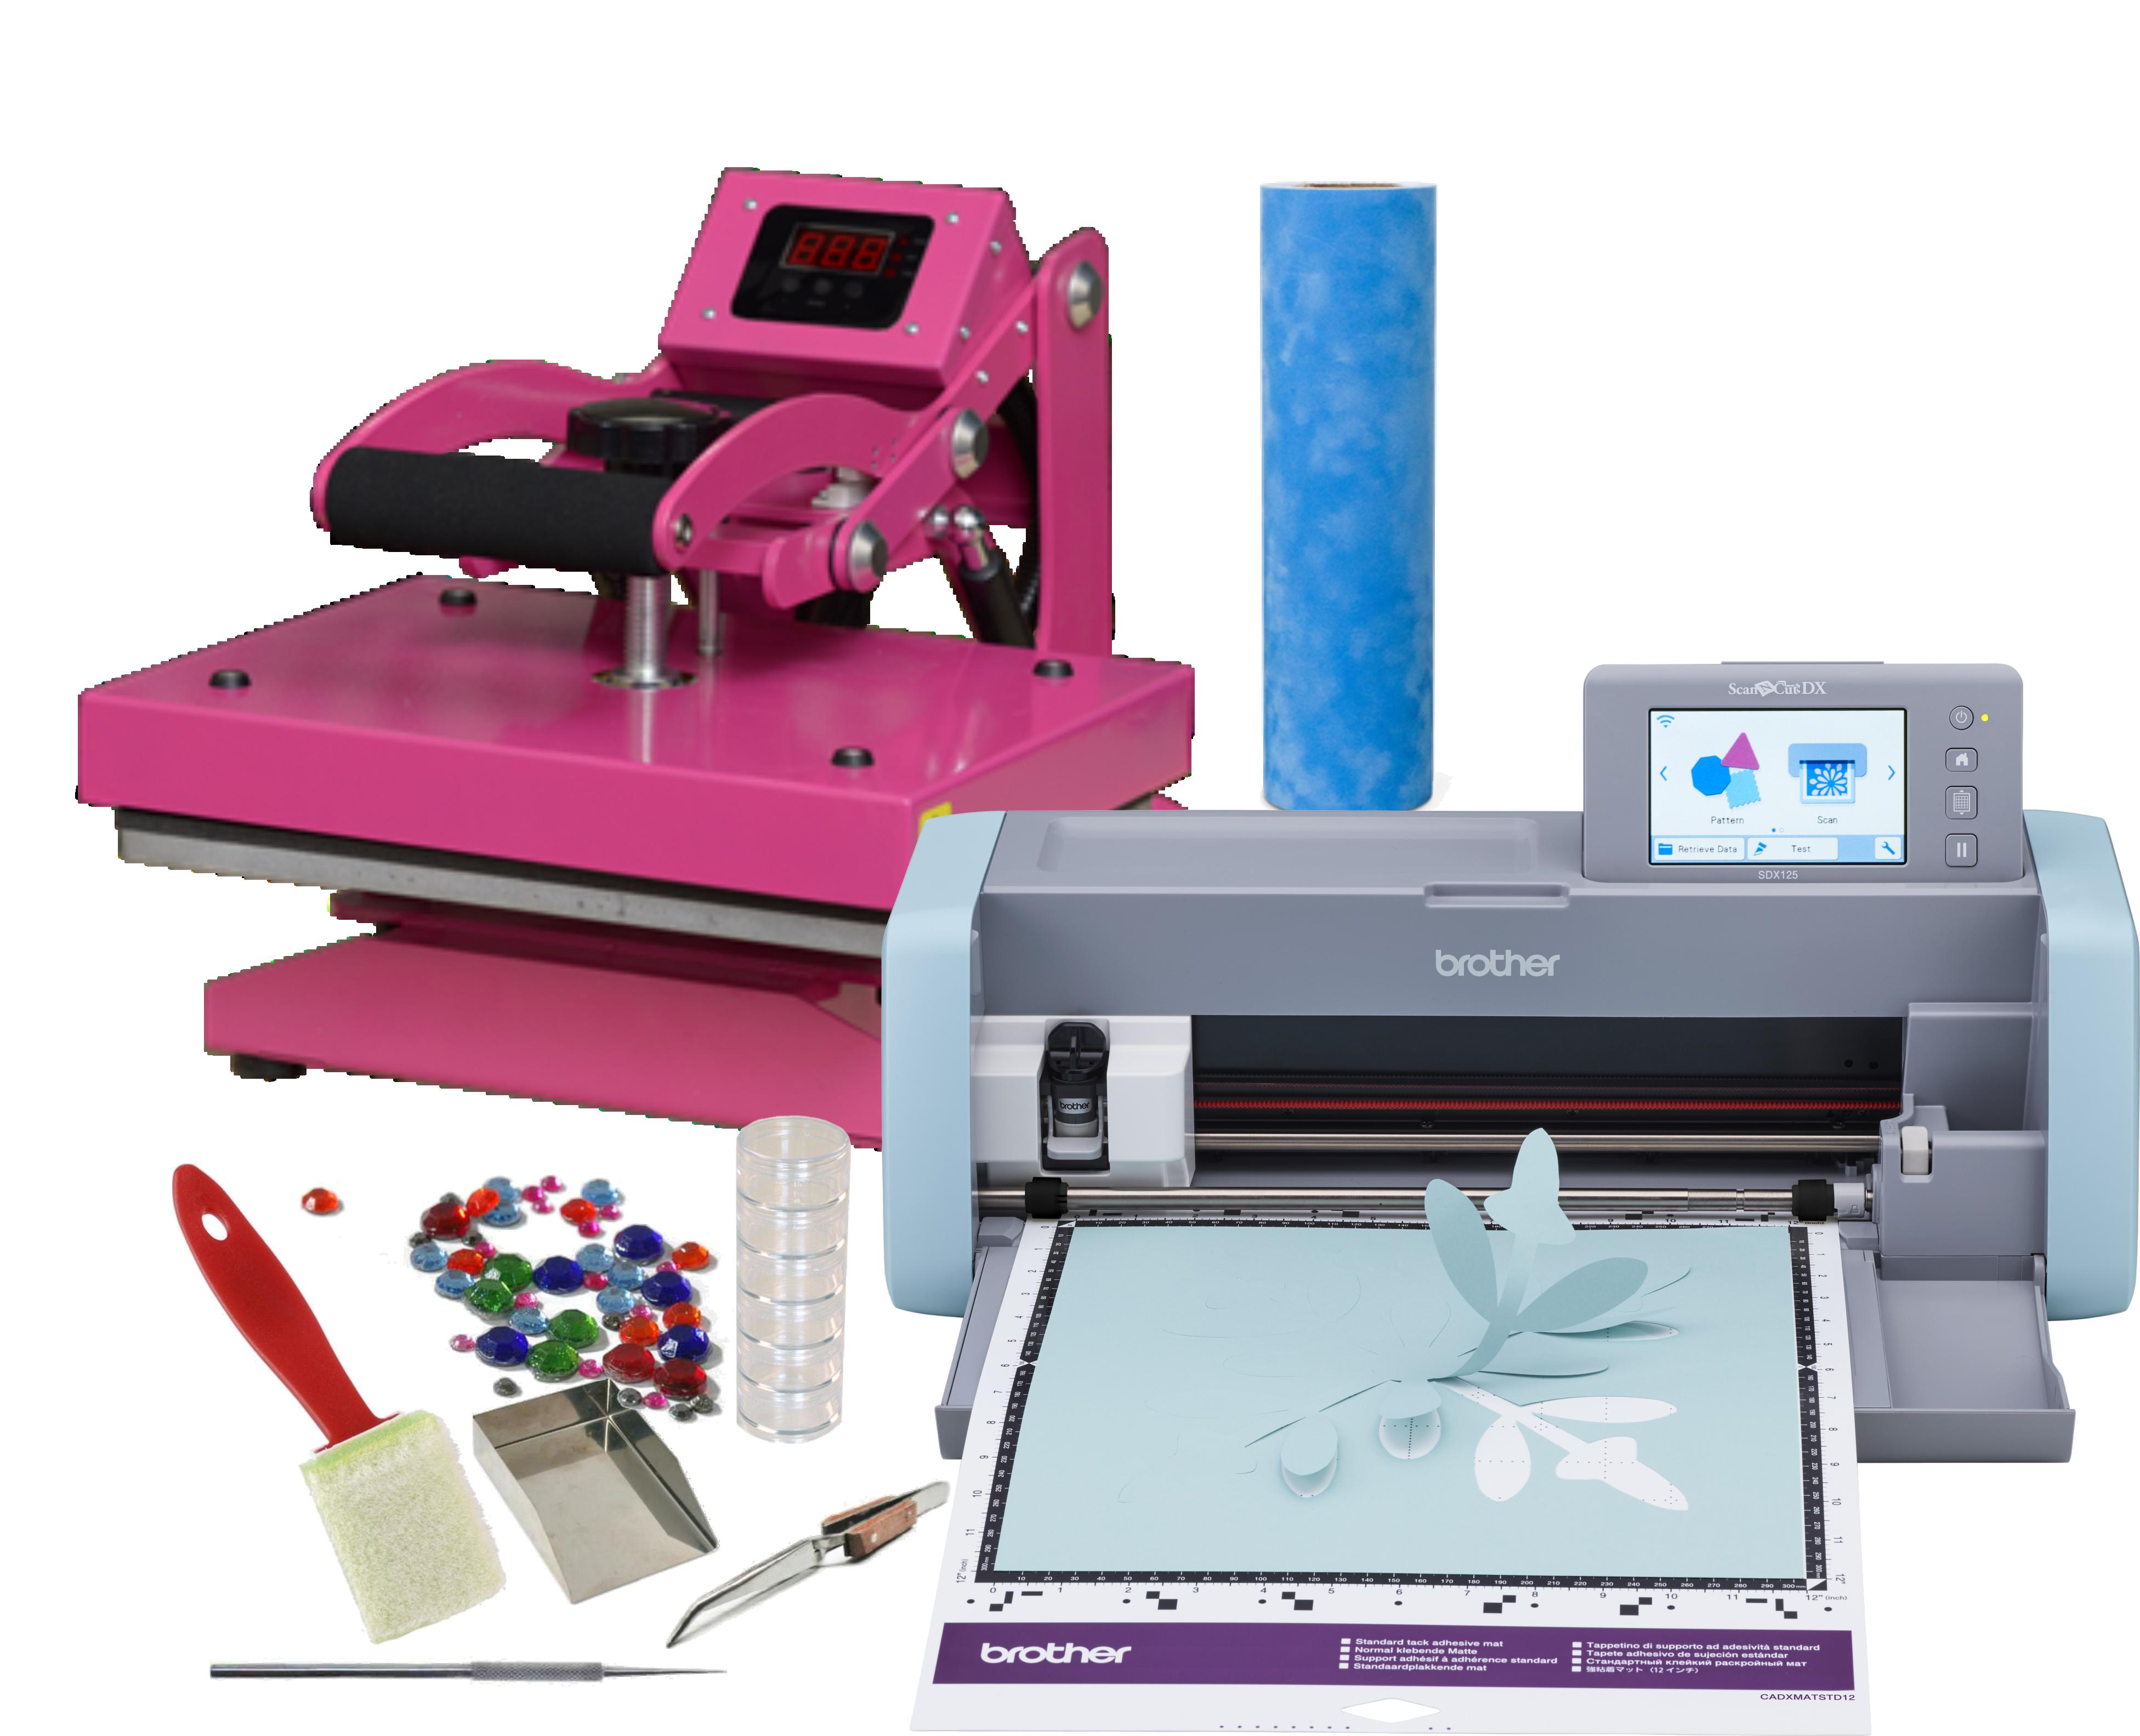 Craft Cutter Heat Press And Rhinestone Bundle And Supplies